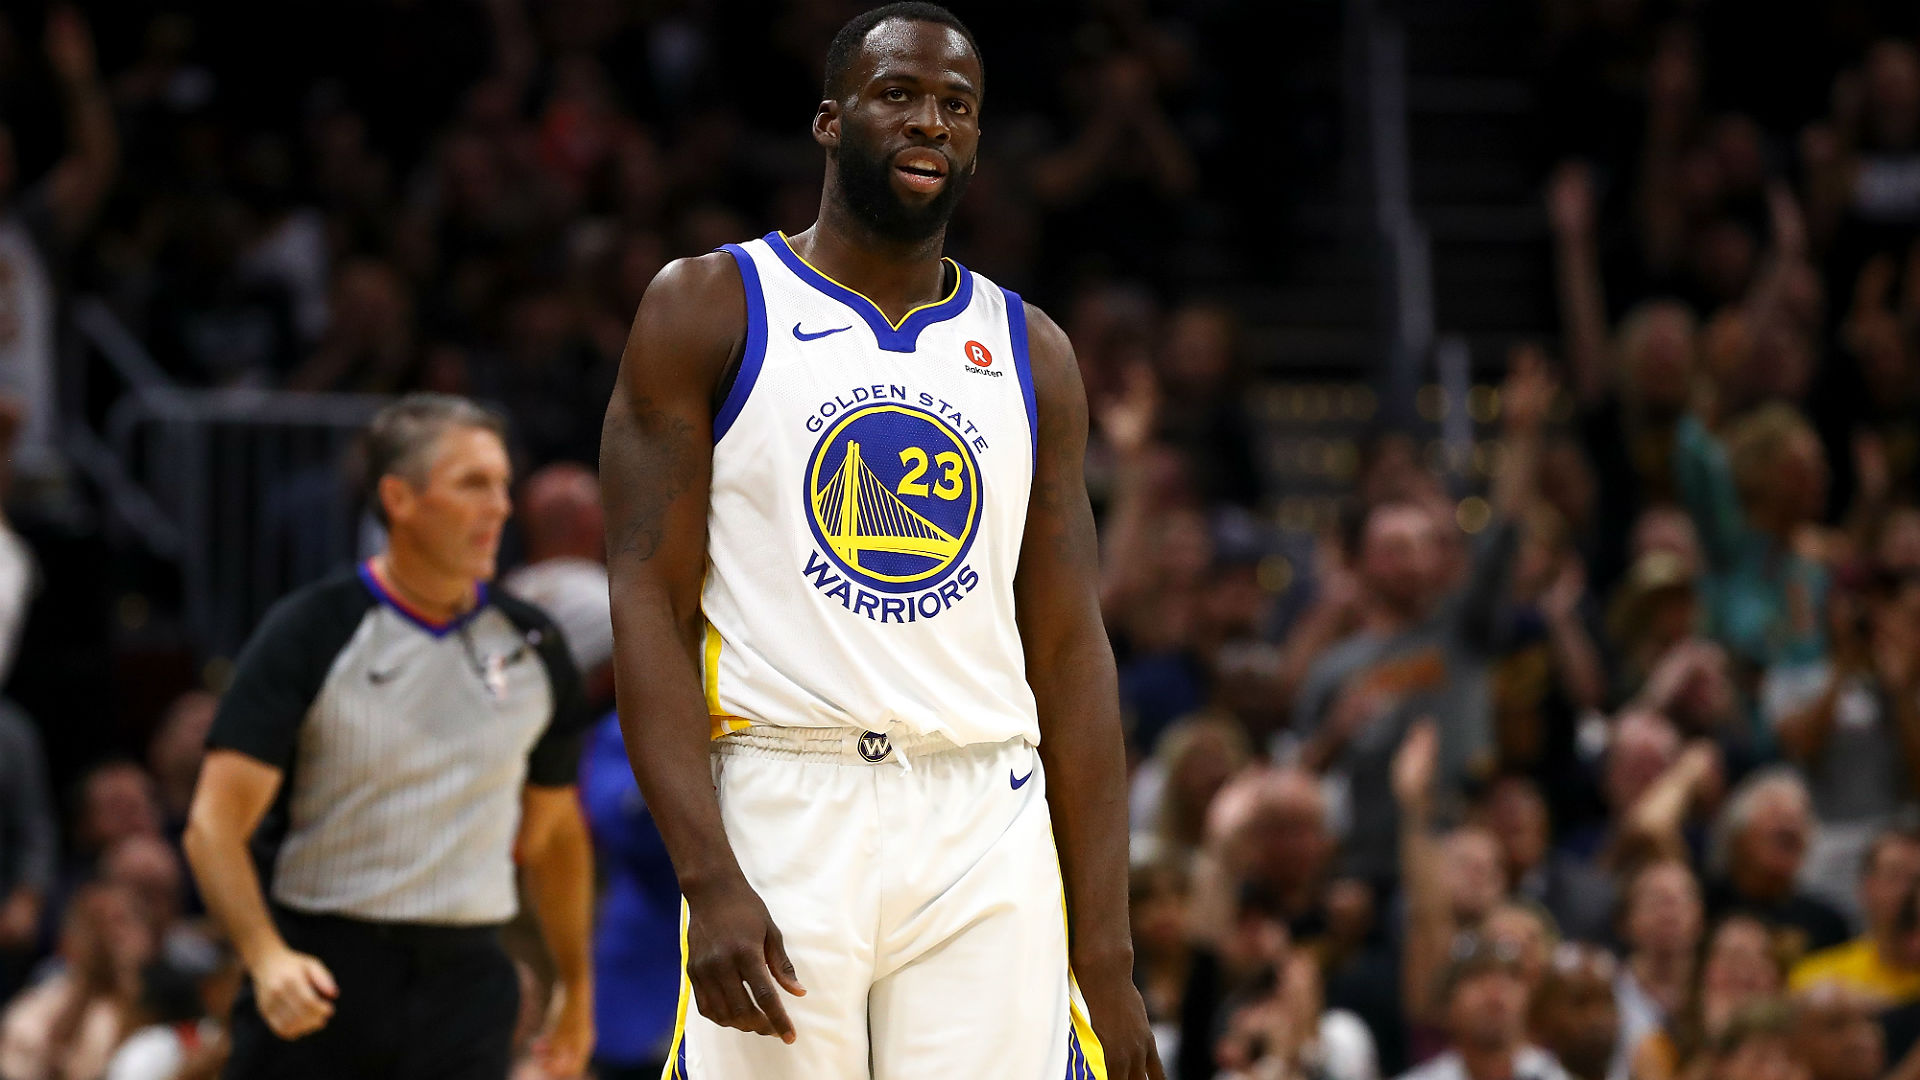 Warriors' Green to return Monday